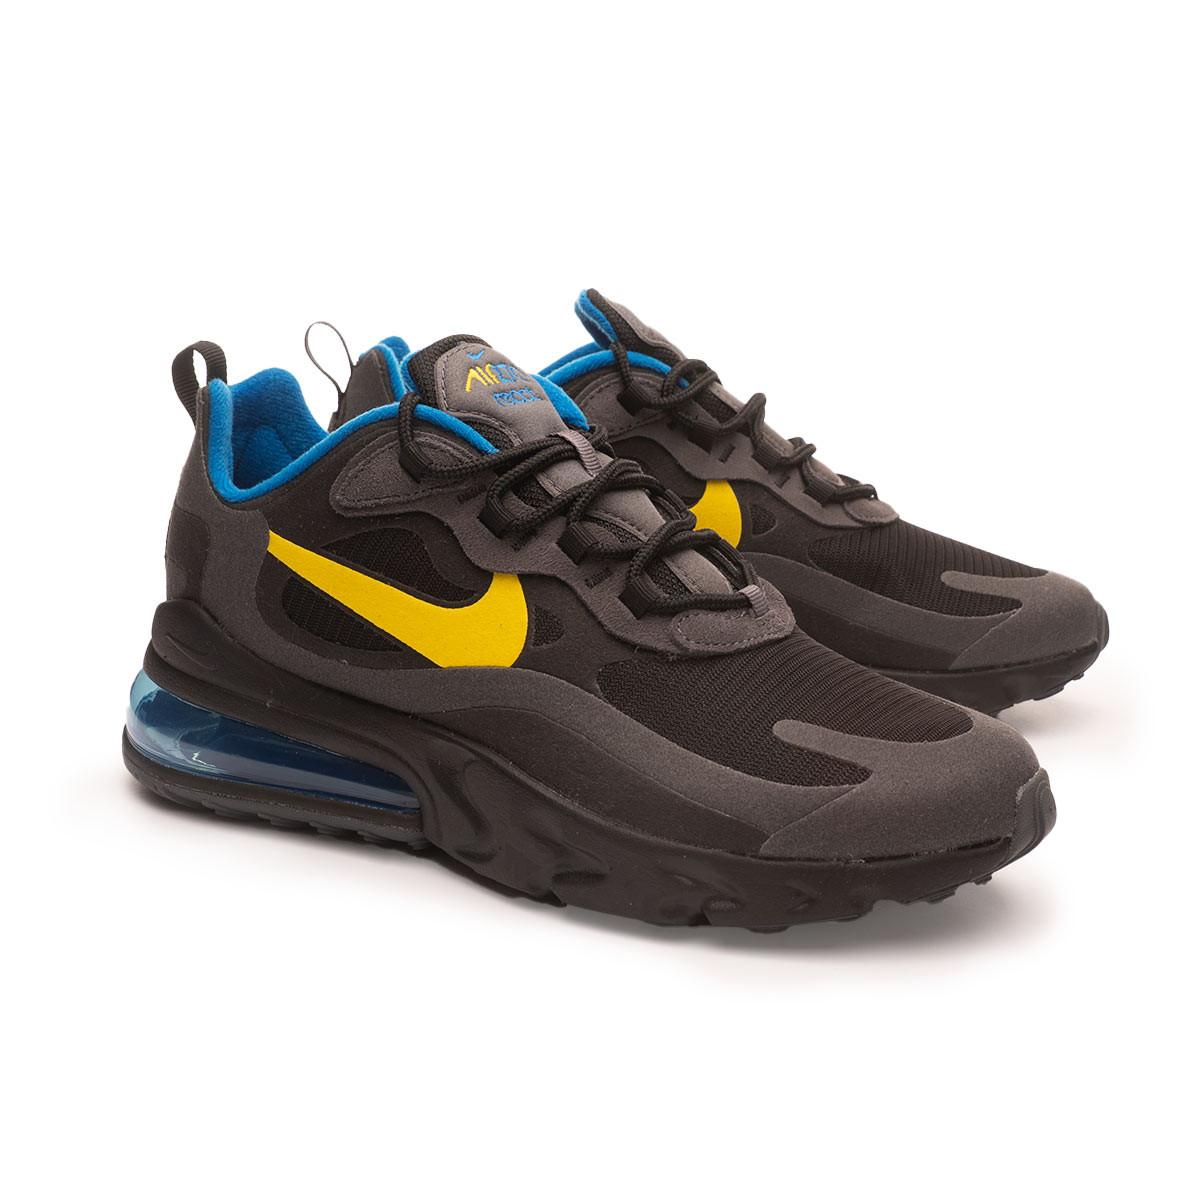 Baskets Nike Air Max 270 React Black-Tour yellow-Dark grey-Blue ...